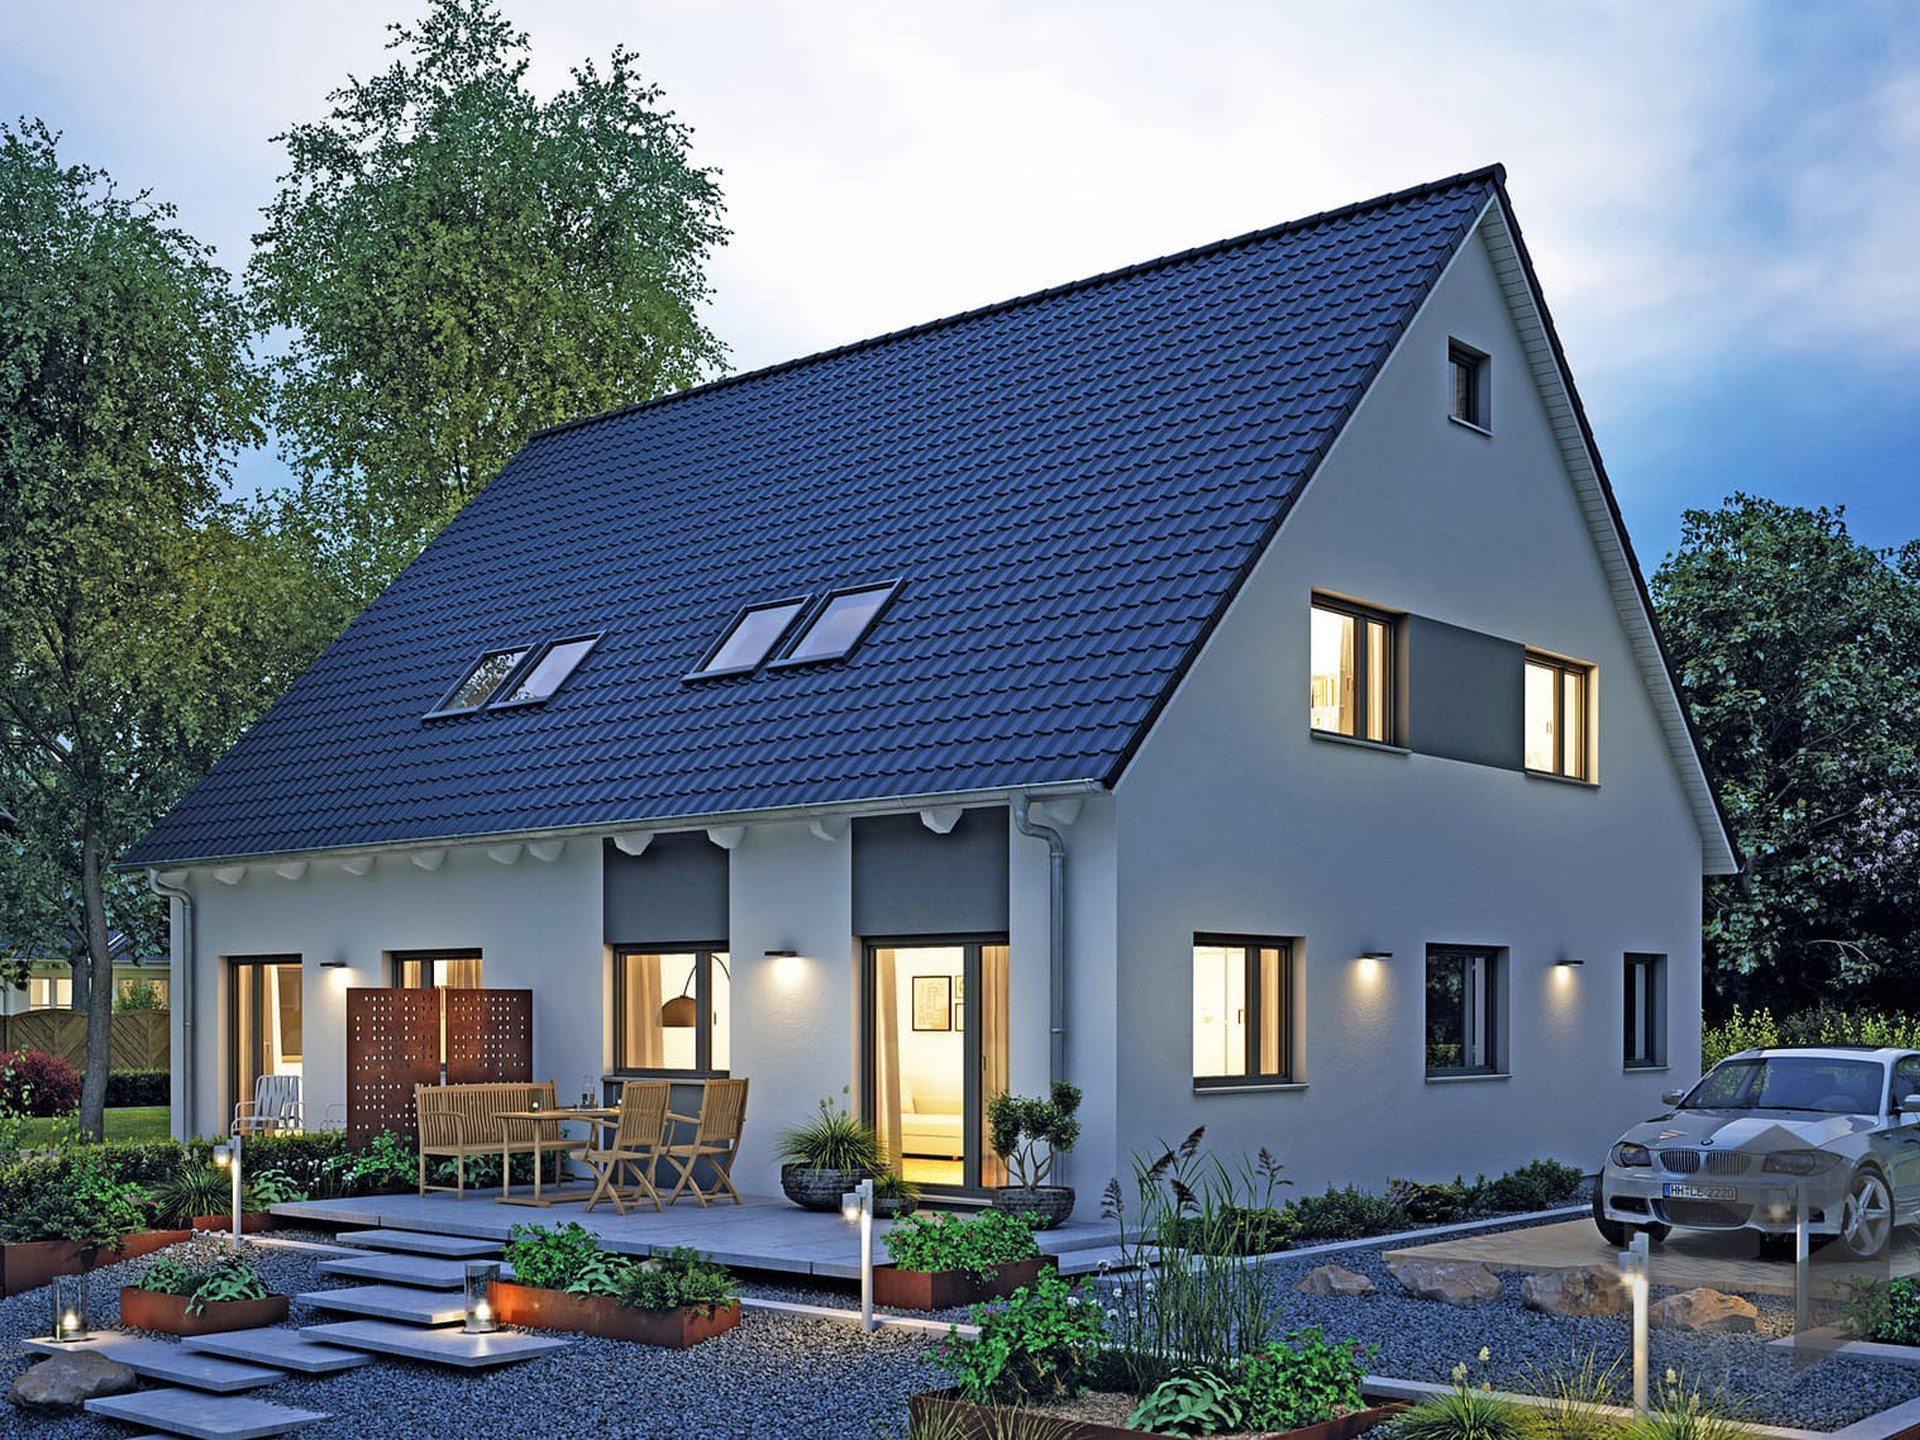 doppelhaus bauen preis doppelhaus bauen preis haus dekoration doppelhaus bauen preis. Black Bedroom Furniture Sets. Home Design Ideas